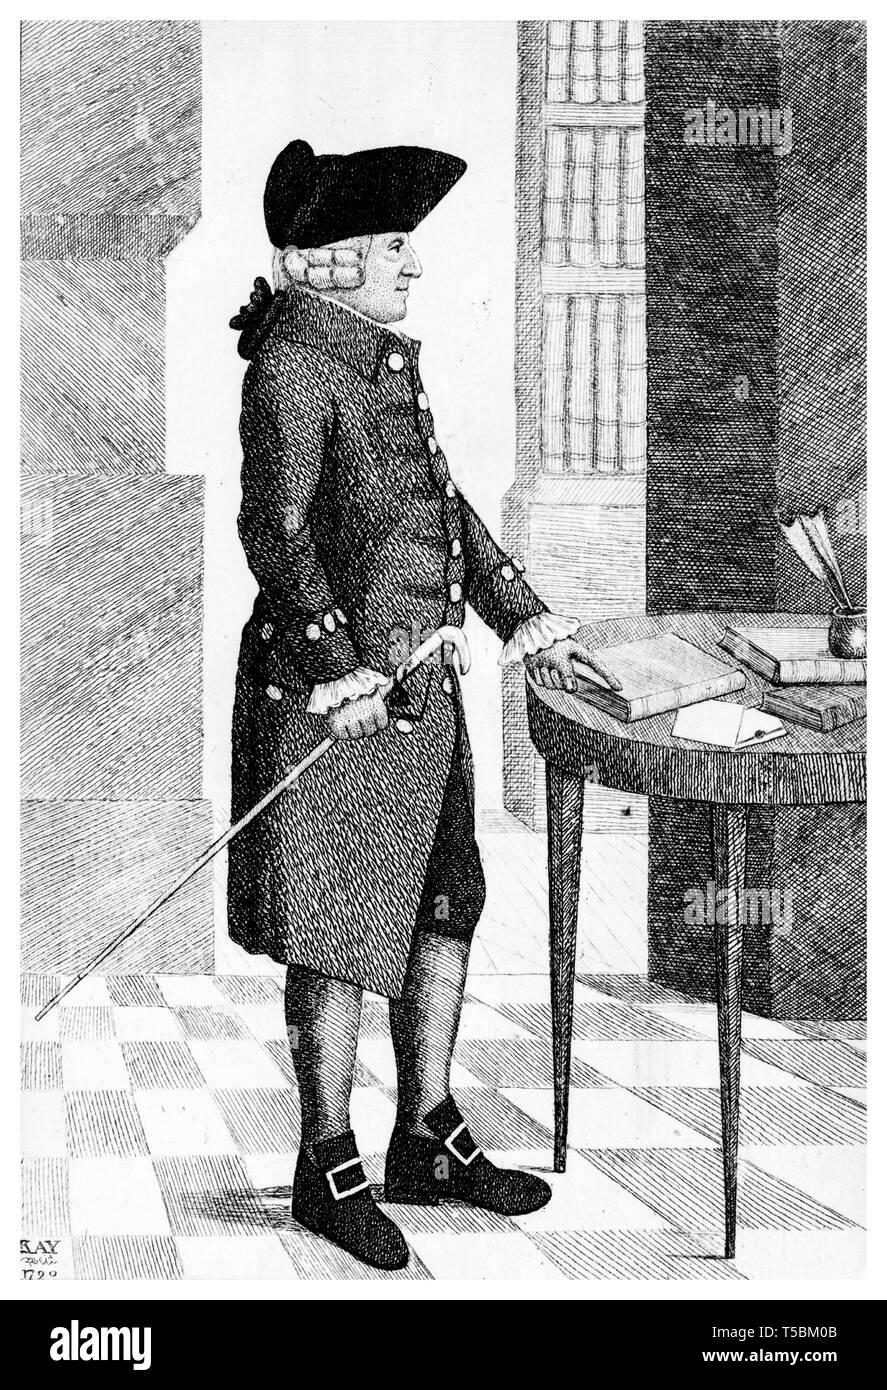 Adam Smith (1723-1790), portrait engraving, 1790 by John Kay Stock Photo